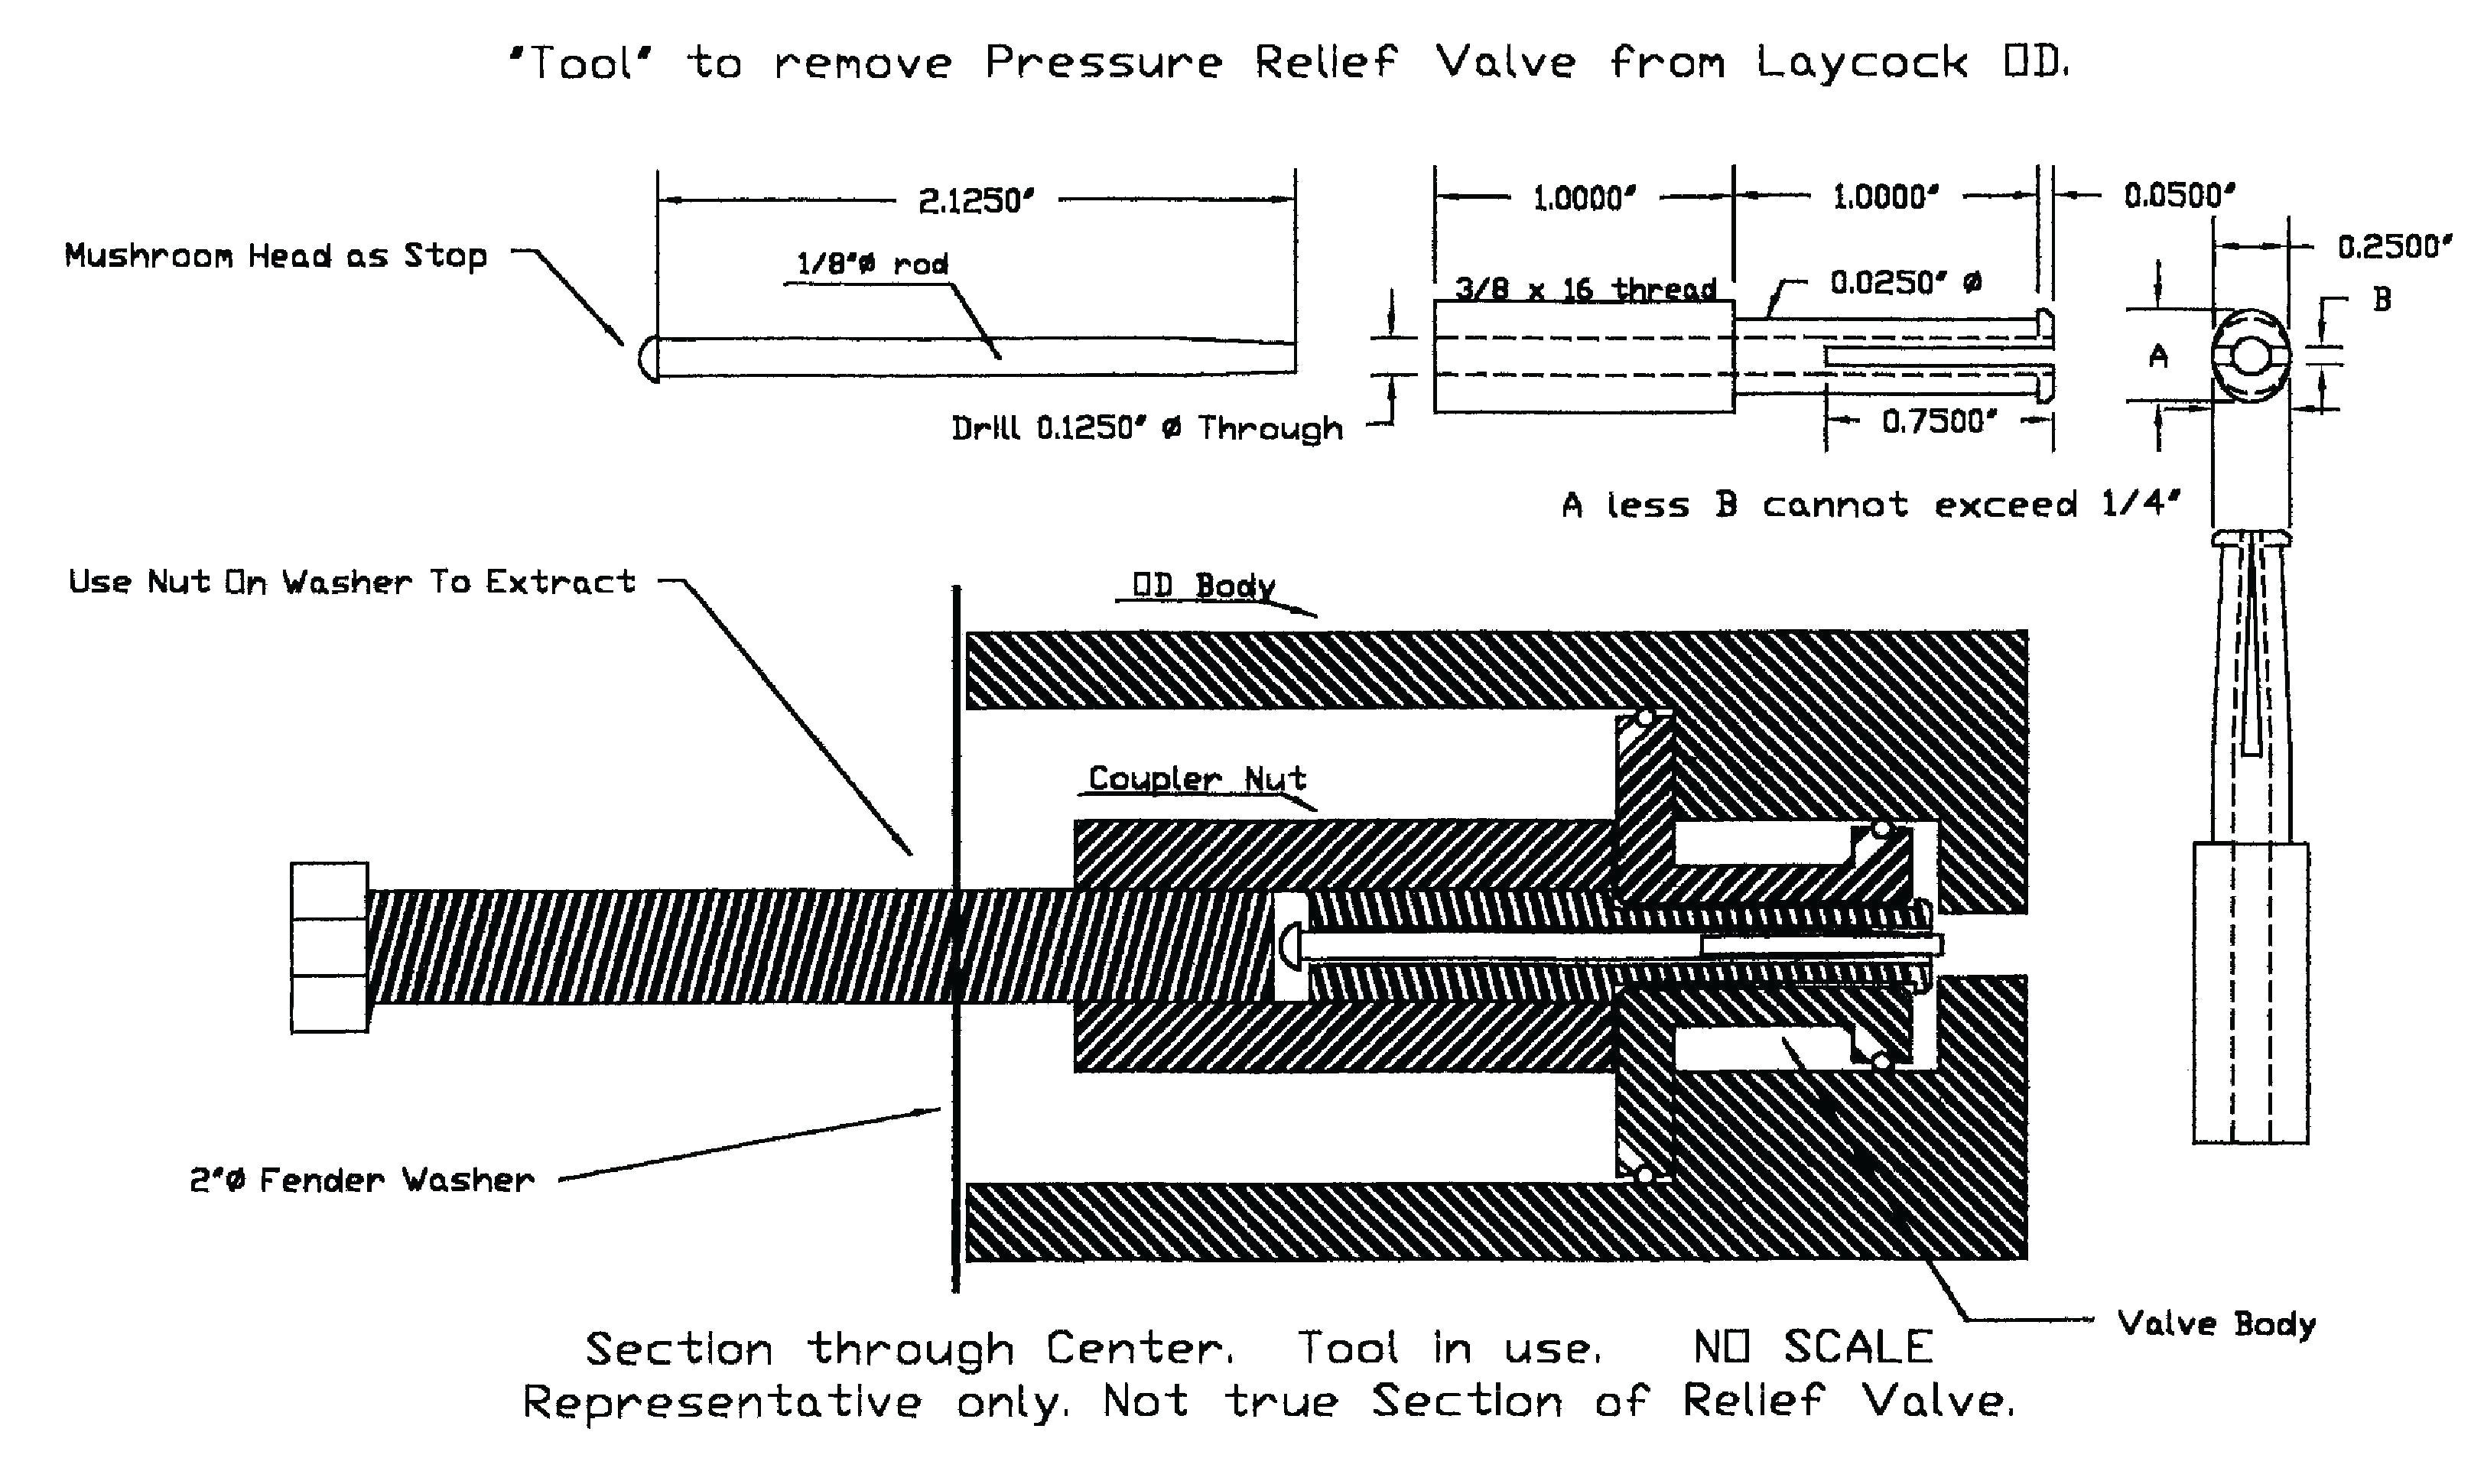 3 Phase Motor Wiring Diagram 12 Leads 3 Phase Motor Wiring Diagram 9 Leads Woodworking